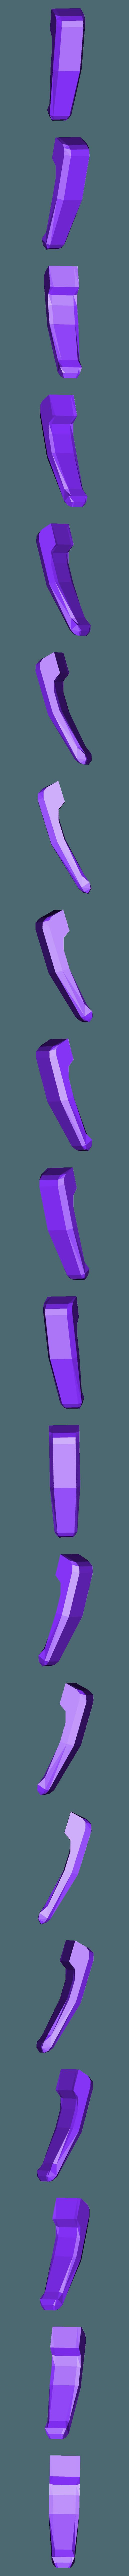 telephone de bureau combiné.stl Download free STL file Telephone +ps4 • 3D printer design, RCGANG93